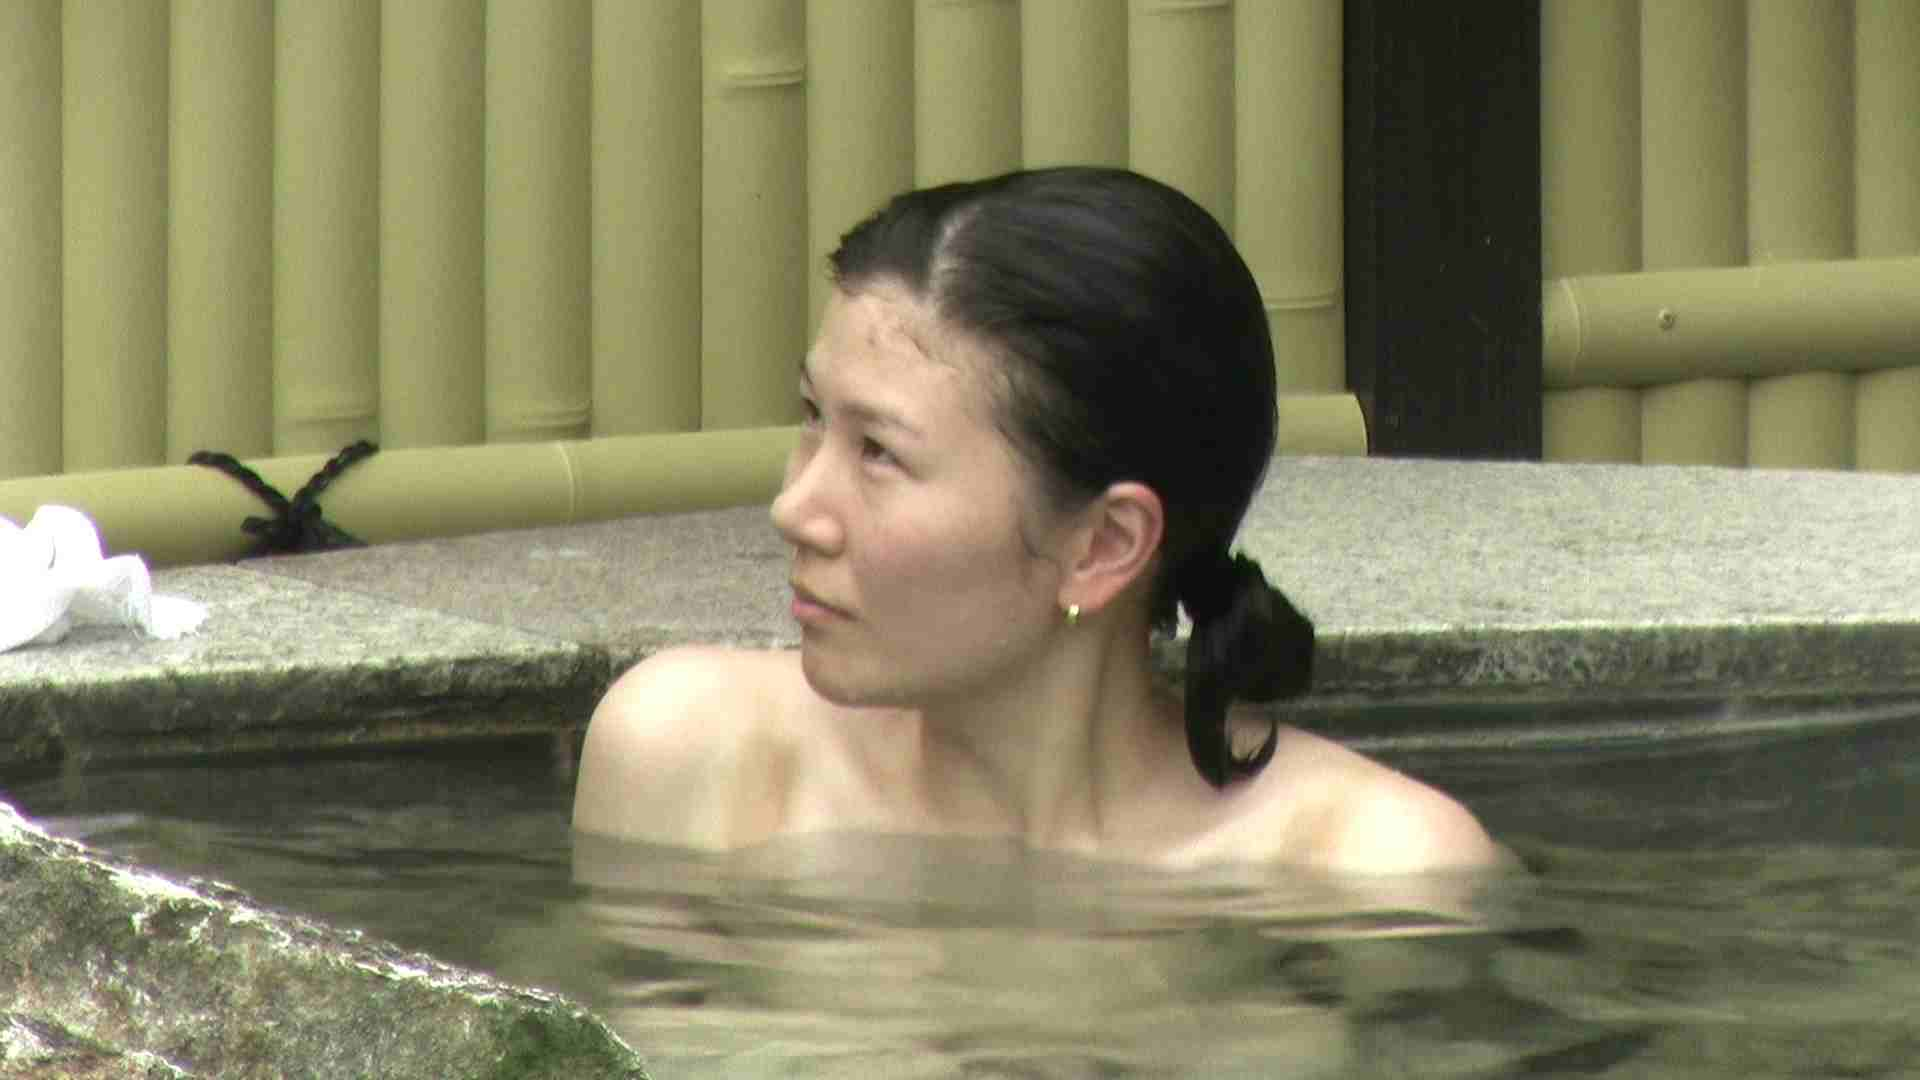 Aquaな露天風呂Vol.187 盗撮映像  99Pix 27